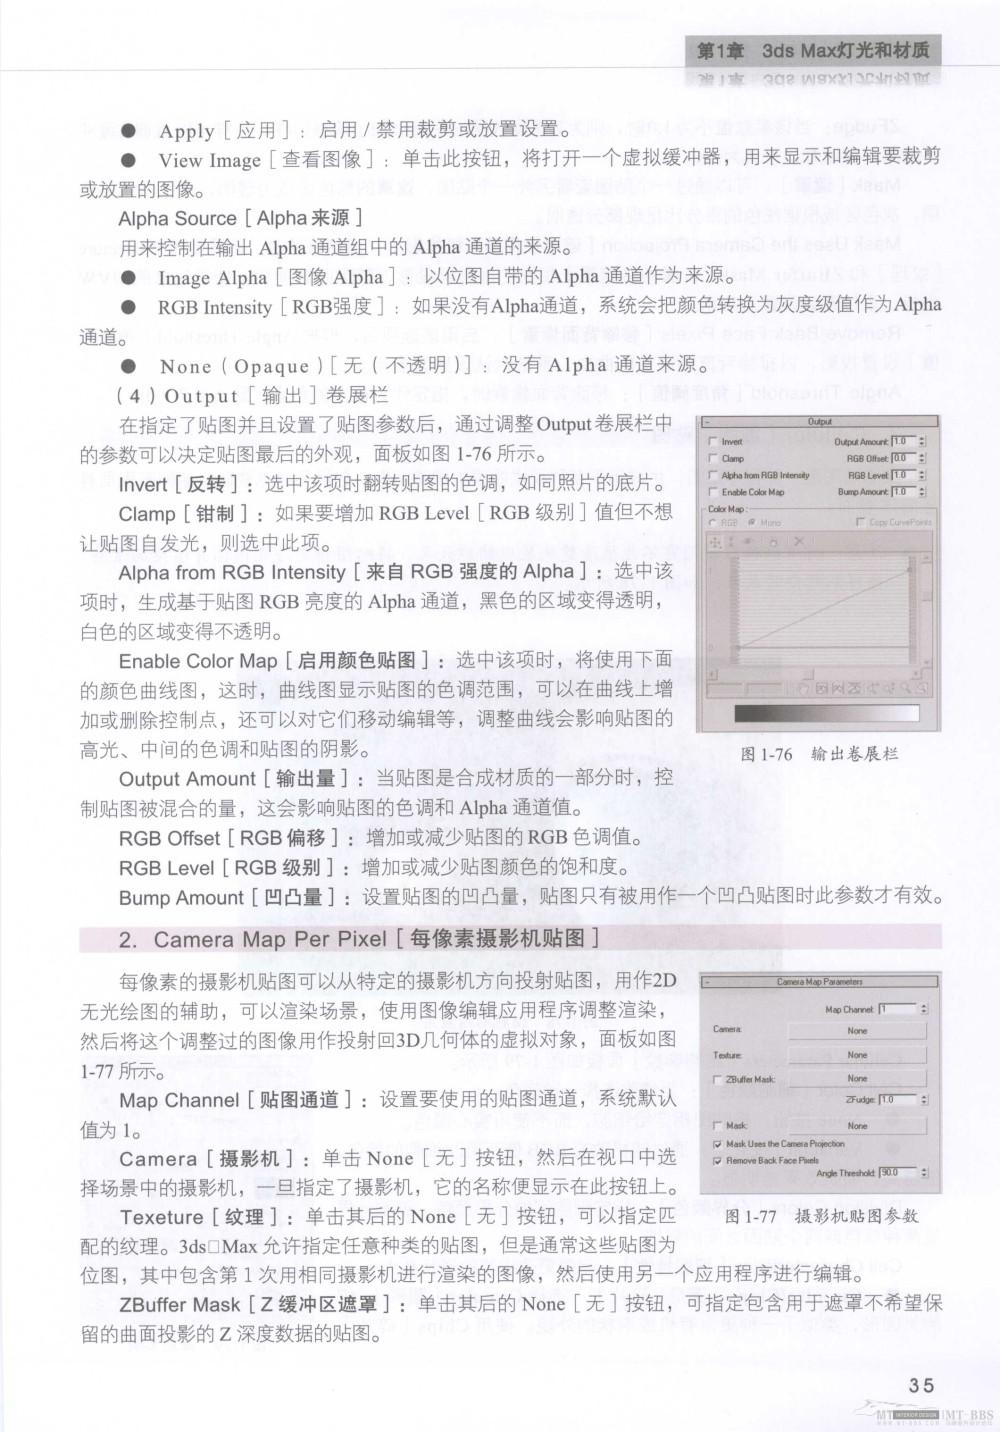 水晶石技法-3ds_Max&VRay室内空间表现_水晶石技法-3ds_Max&VRay室内空间表现_页面_041.jpg